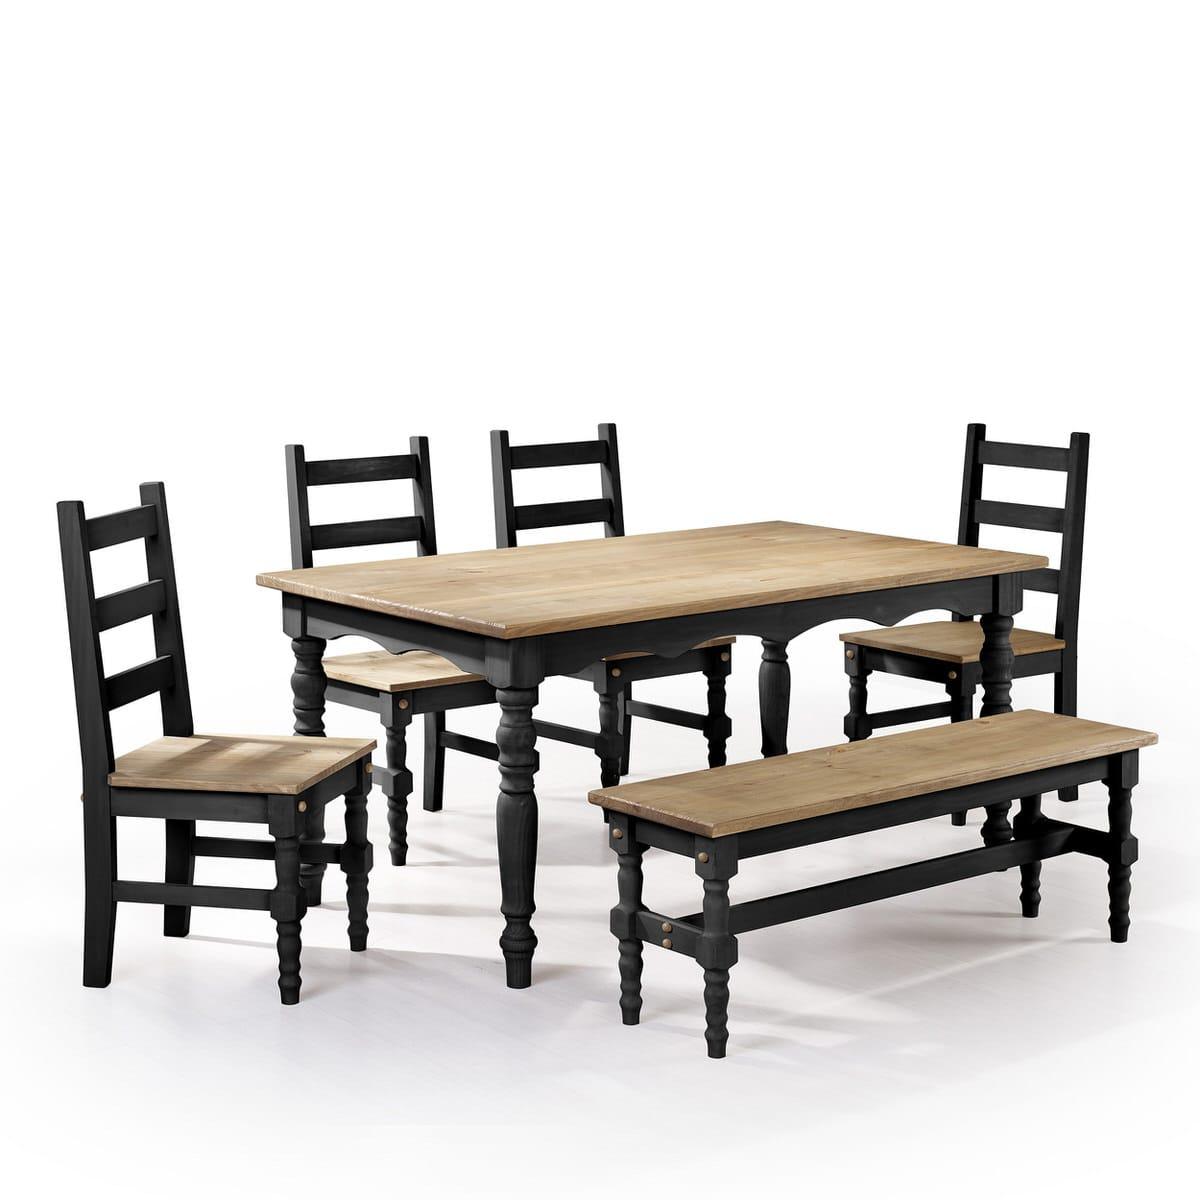 Groovy Jay Black Wash 6 Piece Solid Wood Dining Set By Manhattan Comfort Ibusinesslaw Wood Chair Design Ideas Ibusinesslaworg